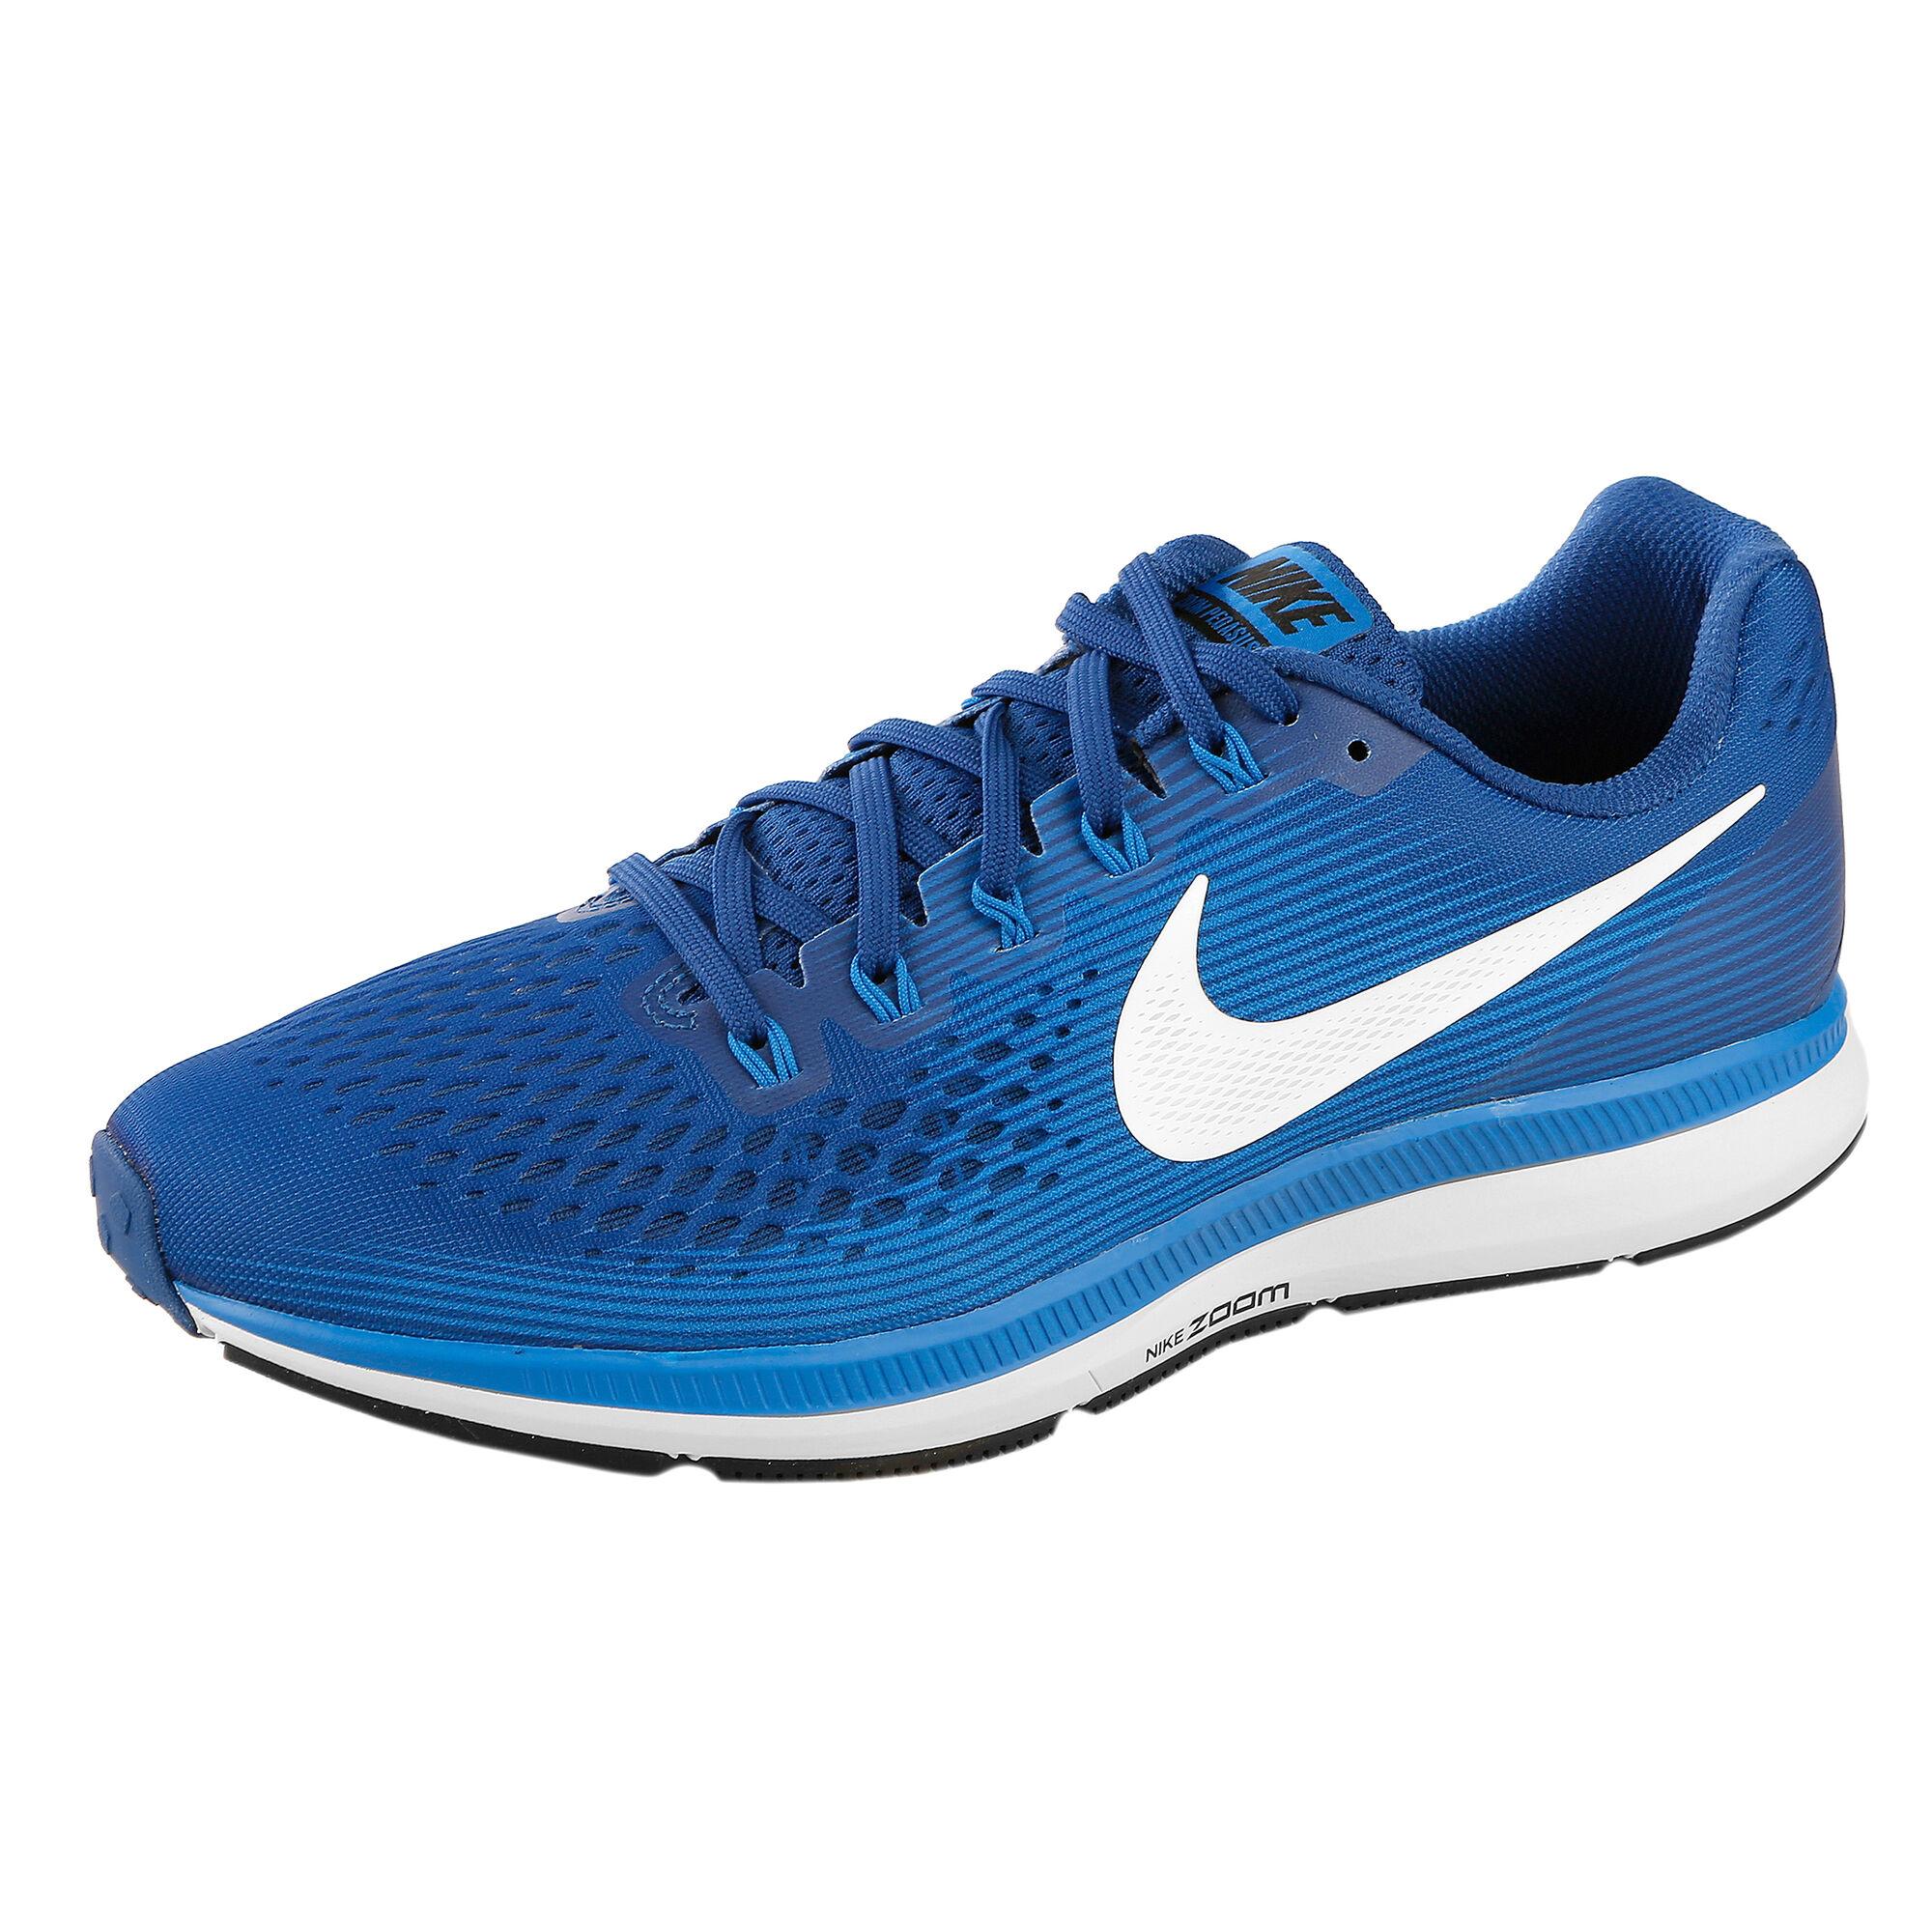 big sale e96ce b104a Nike Air Zoom Pegasus 34 Neutral Running Shoe Men - Blue, White